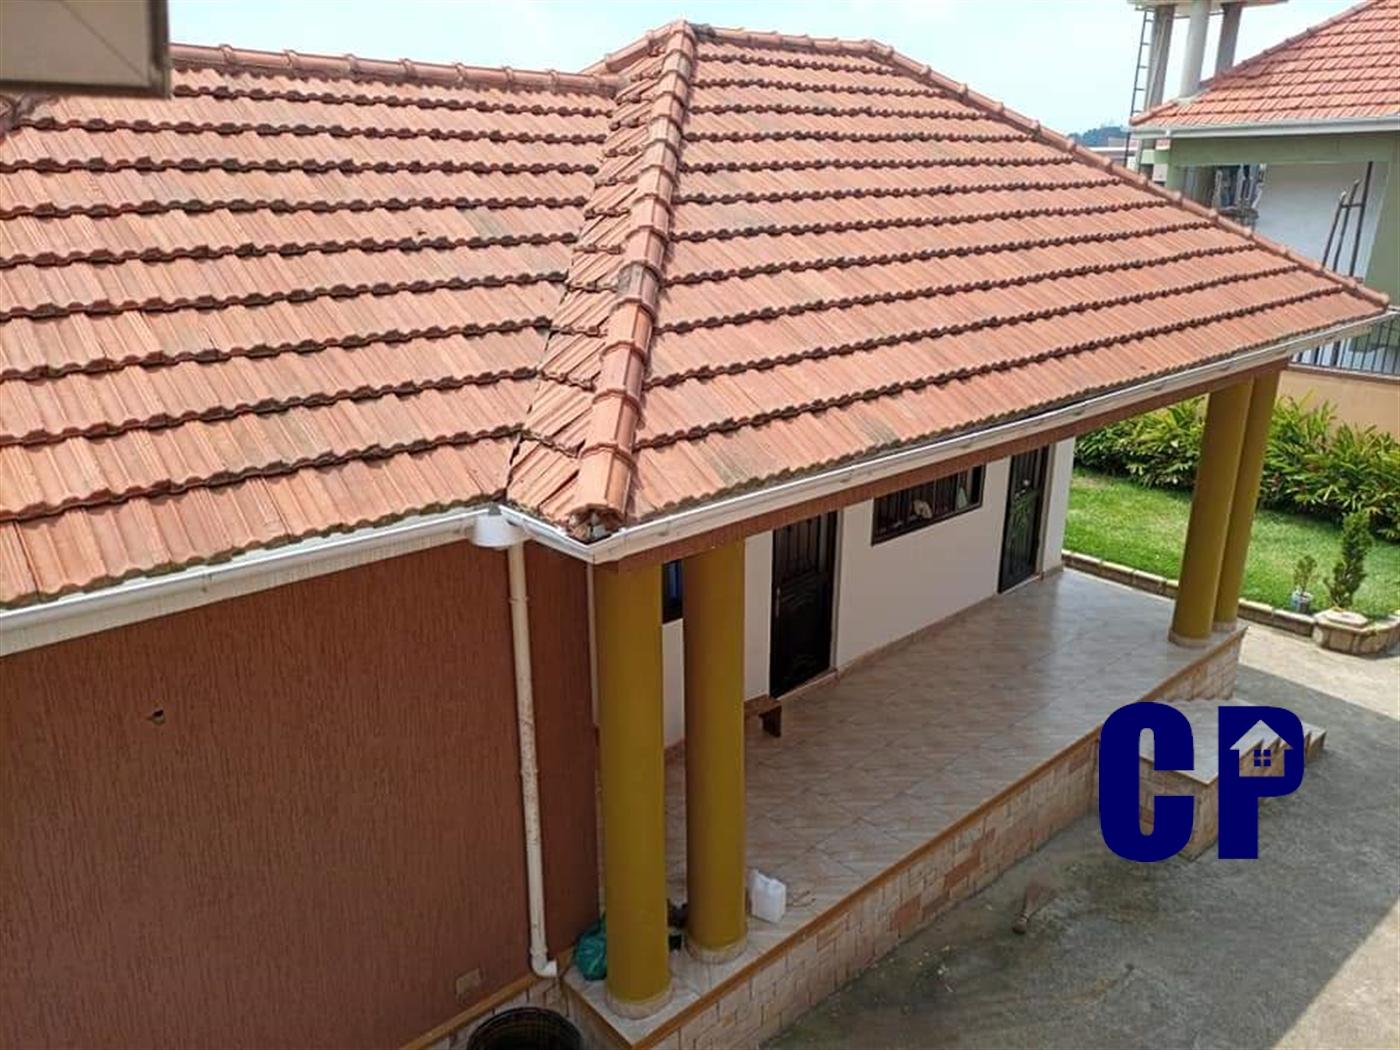 Storyed house for sale in Butabika Kampala